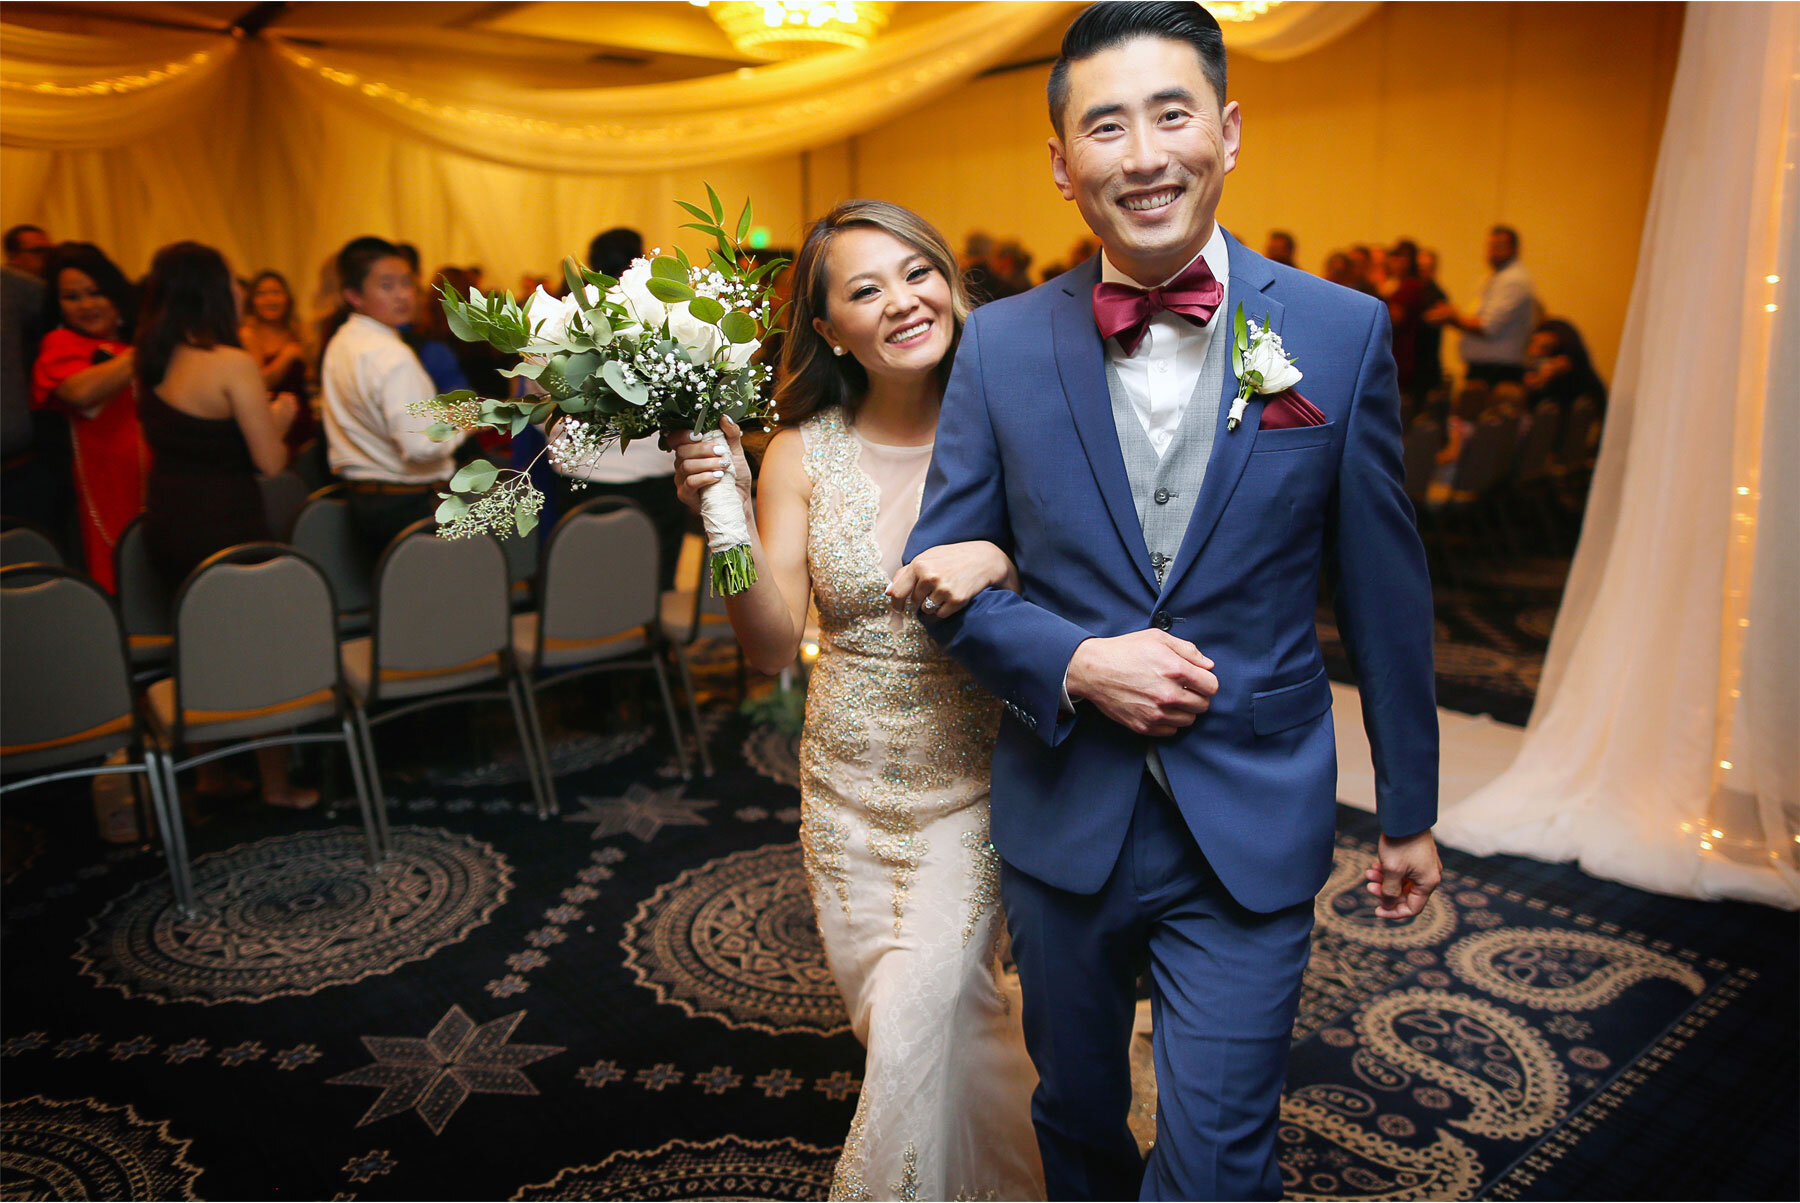 15-Vick-Photography-Minneapolis-Minnesota-The-Graduate-Hotel-Ceremony-Bride-Groom-Mai-&-Ross.jpg